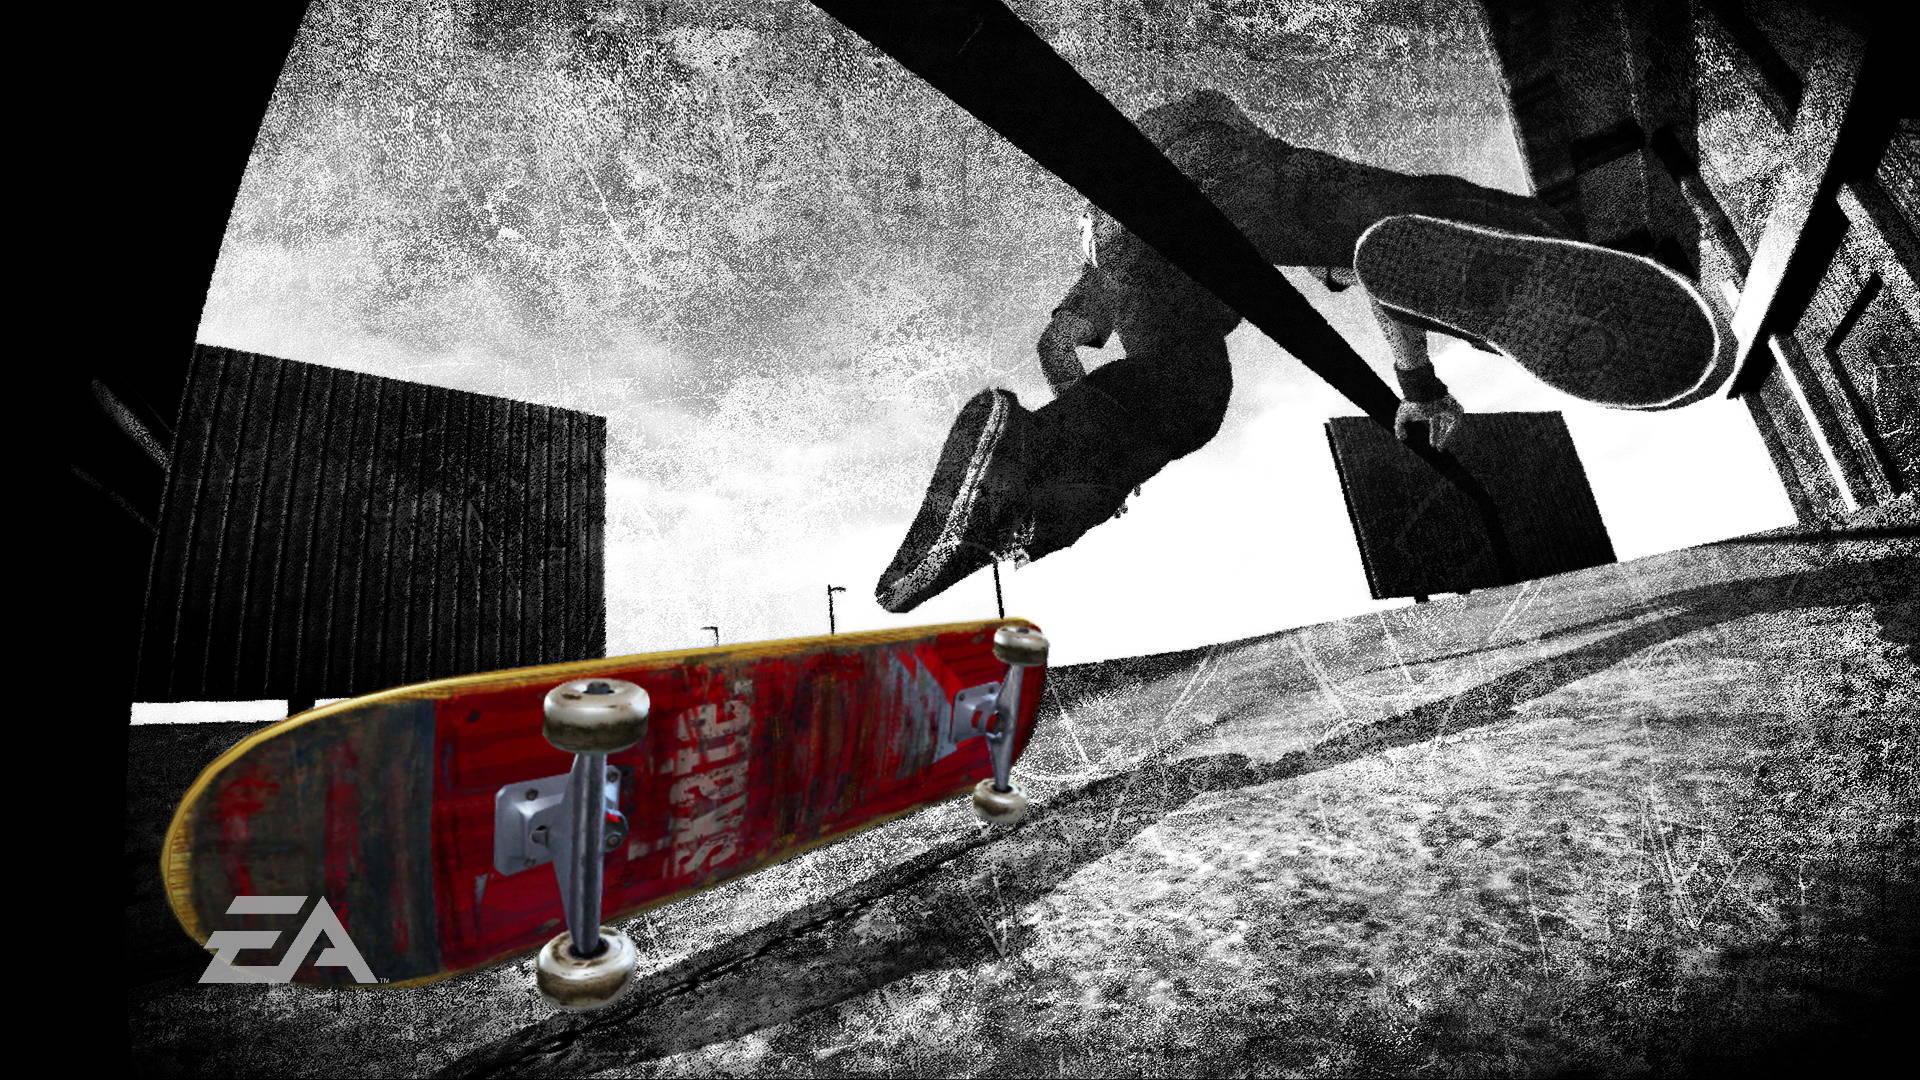 Skateboarding Wallpaper 1080p Background Free Download 61916 Label .